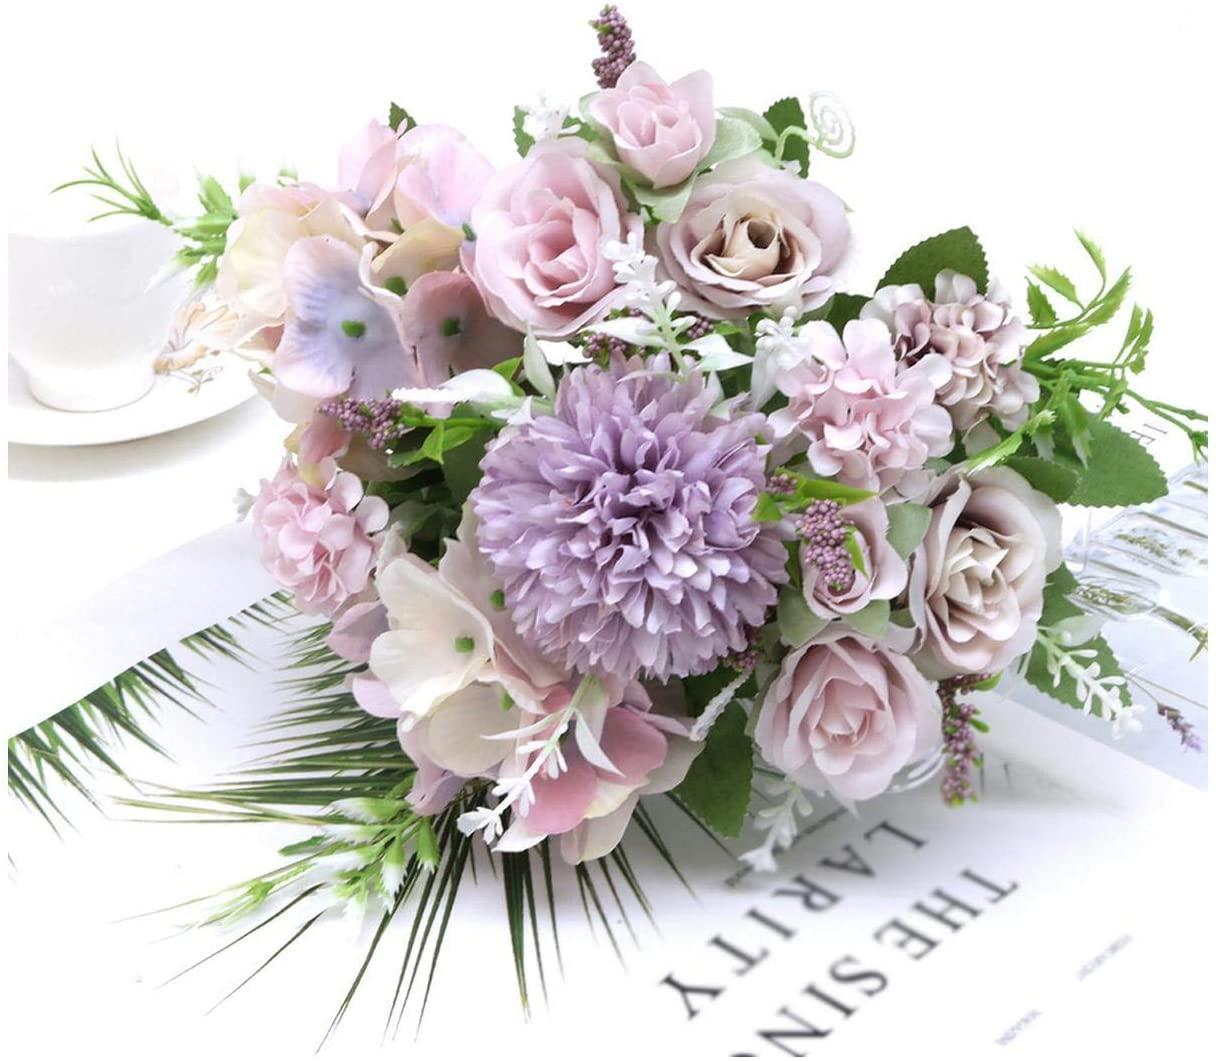 MUZIBLUE Babys Breath Artificial Flowers| 7 Heads Hydrangea Flowers Artificial Bouquet Silk Blooming Fake Peony Bridal Hand Flower Roses Wedding Centerpieces Decor-15